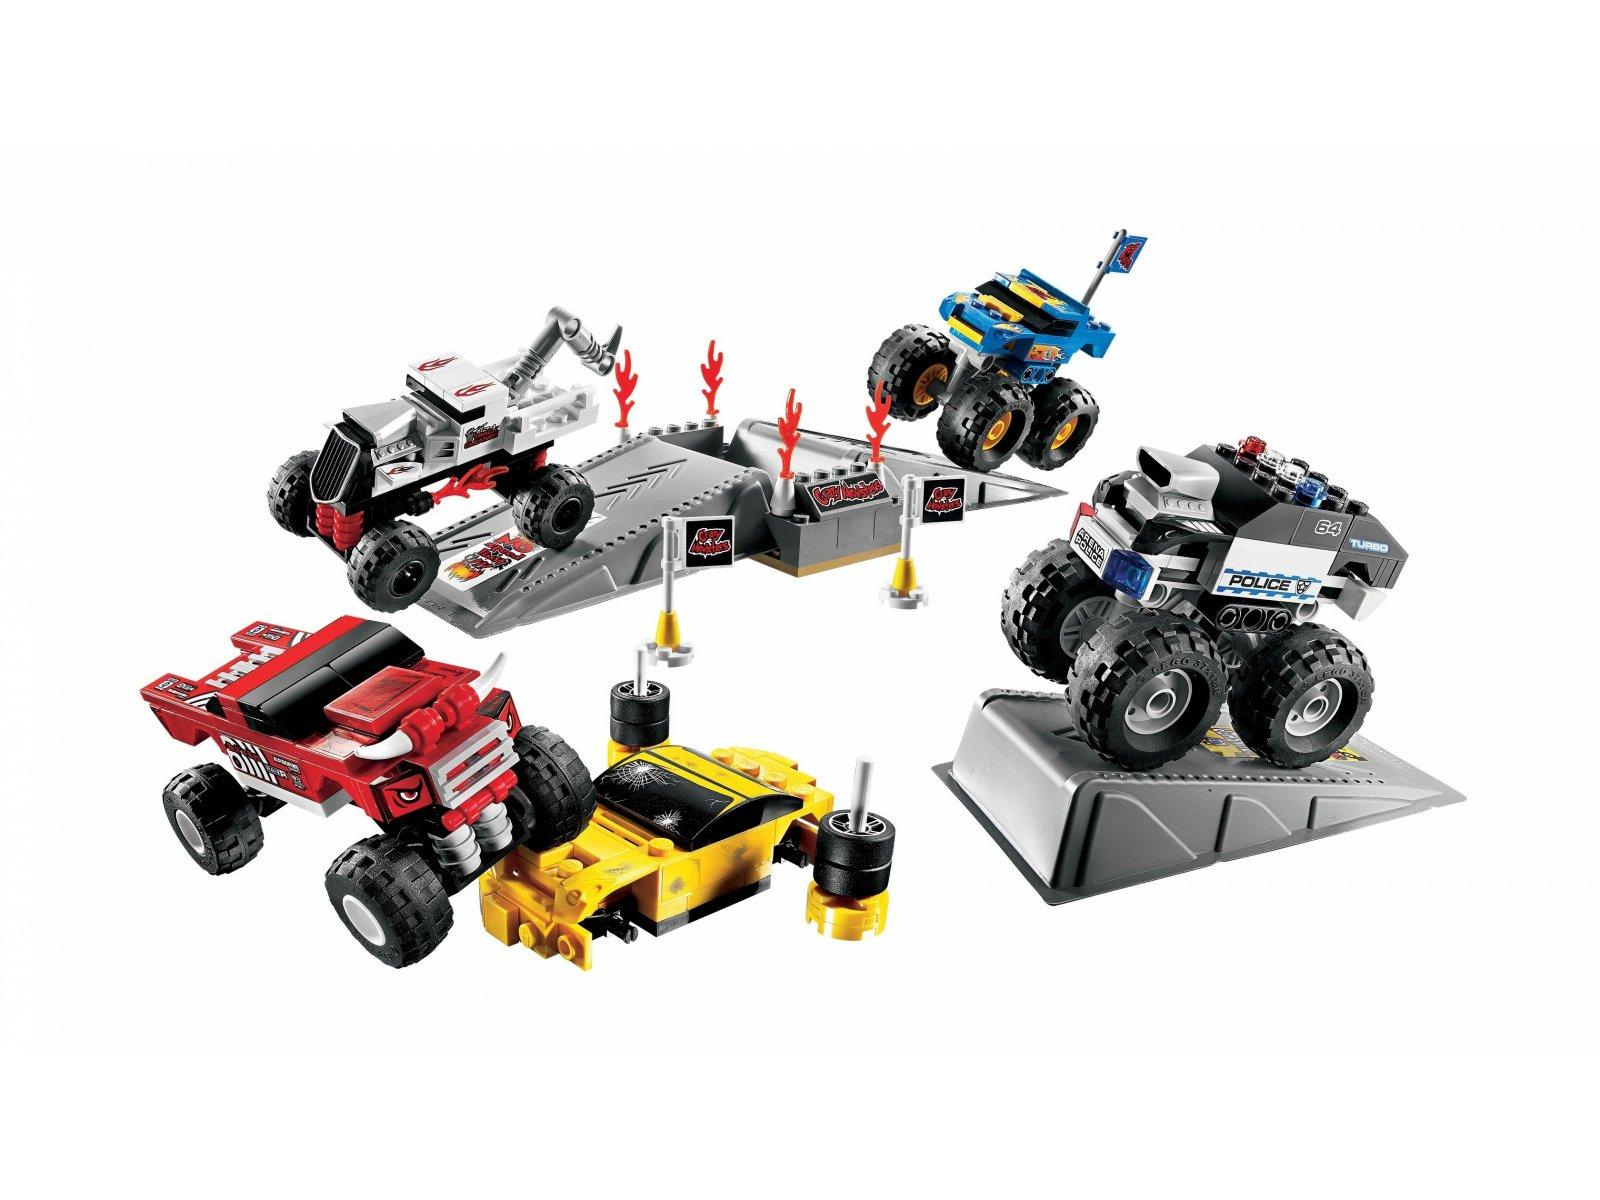 LEGO Racers 8182 Monster Crushers